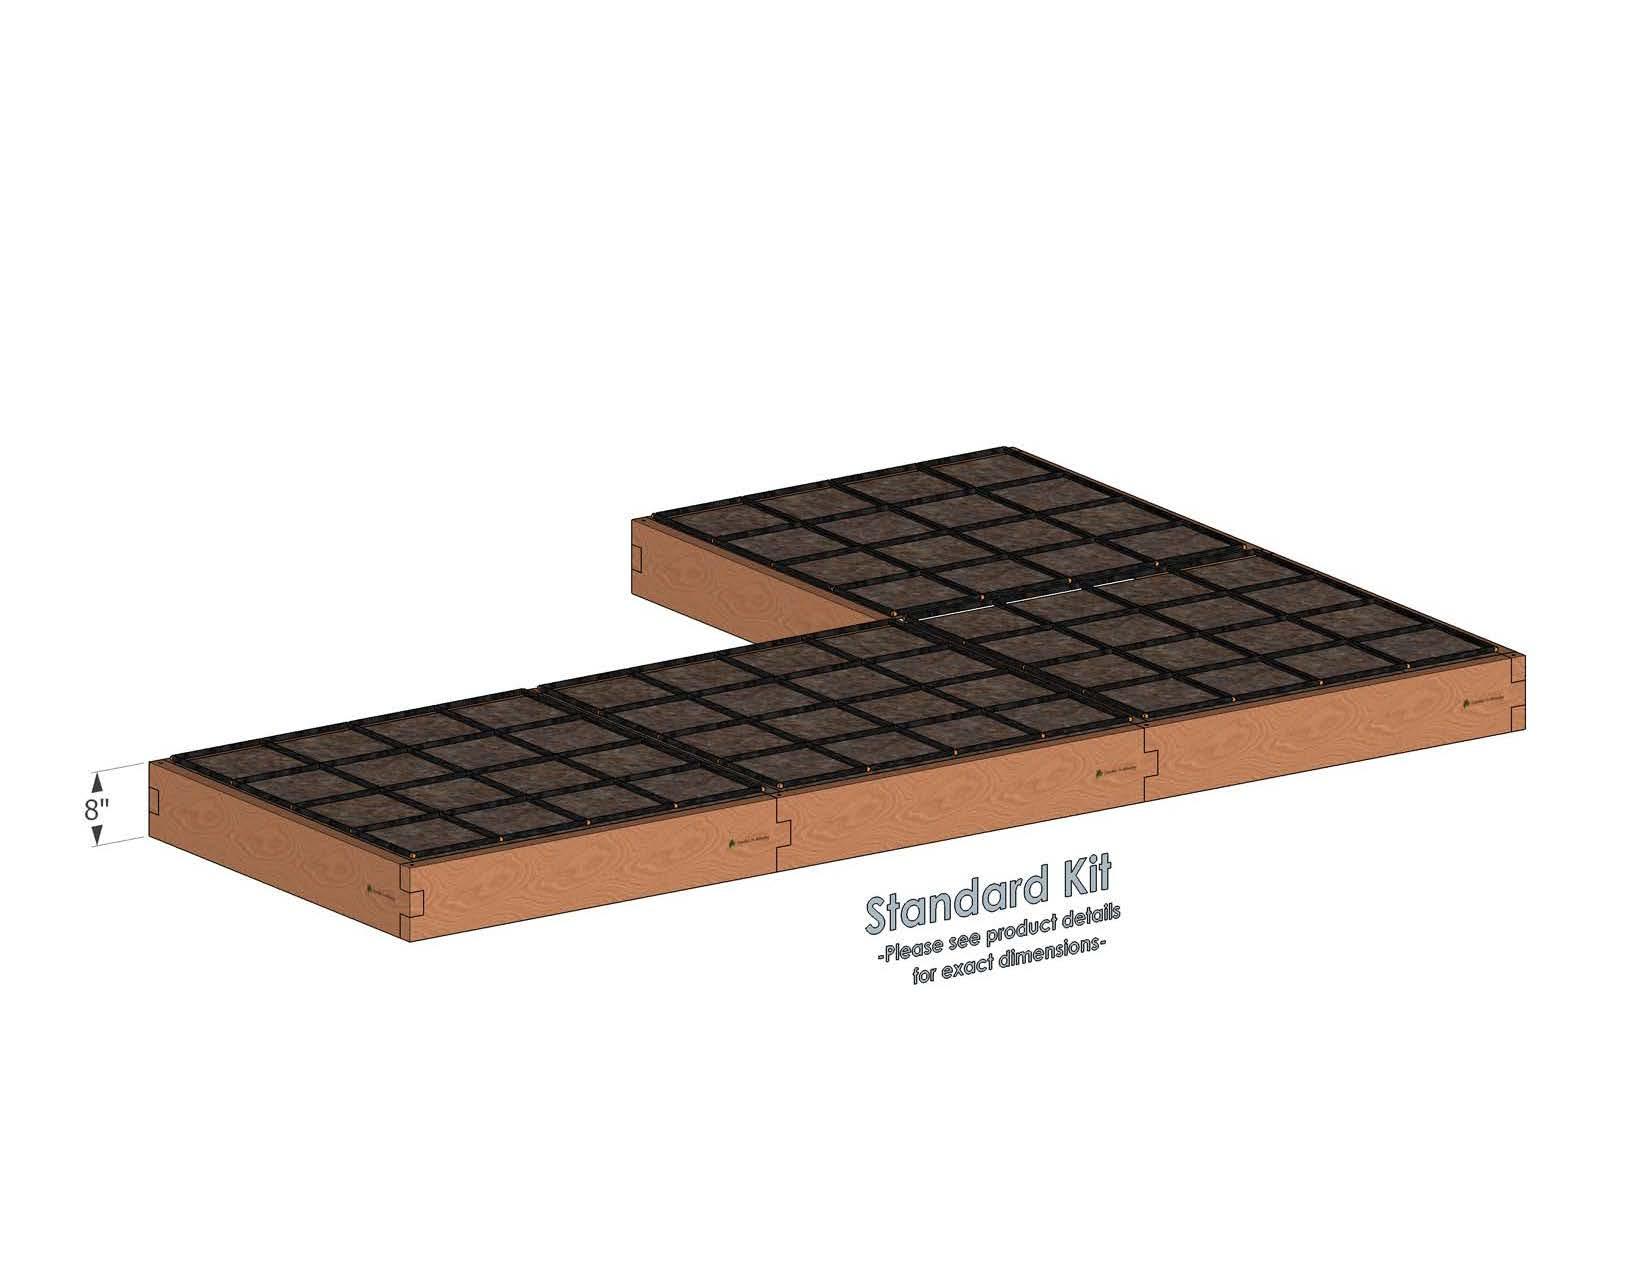 L Shaped Raised Garden Kit Standard Bed